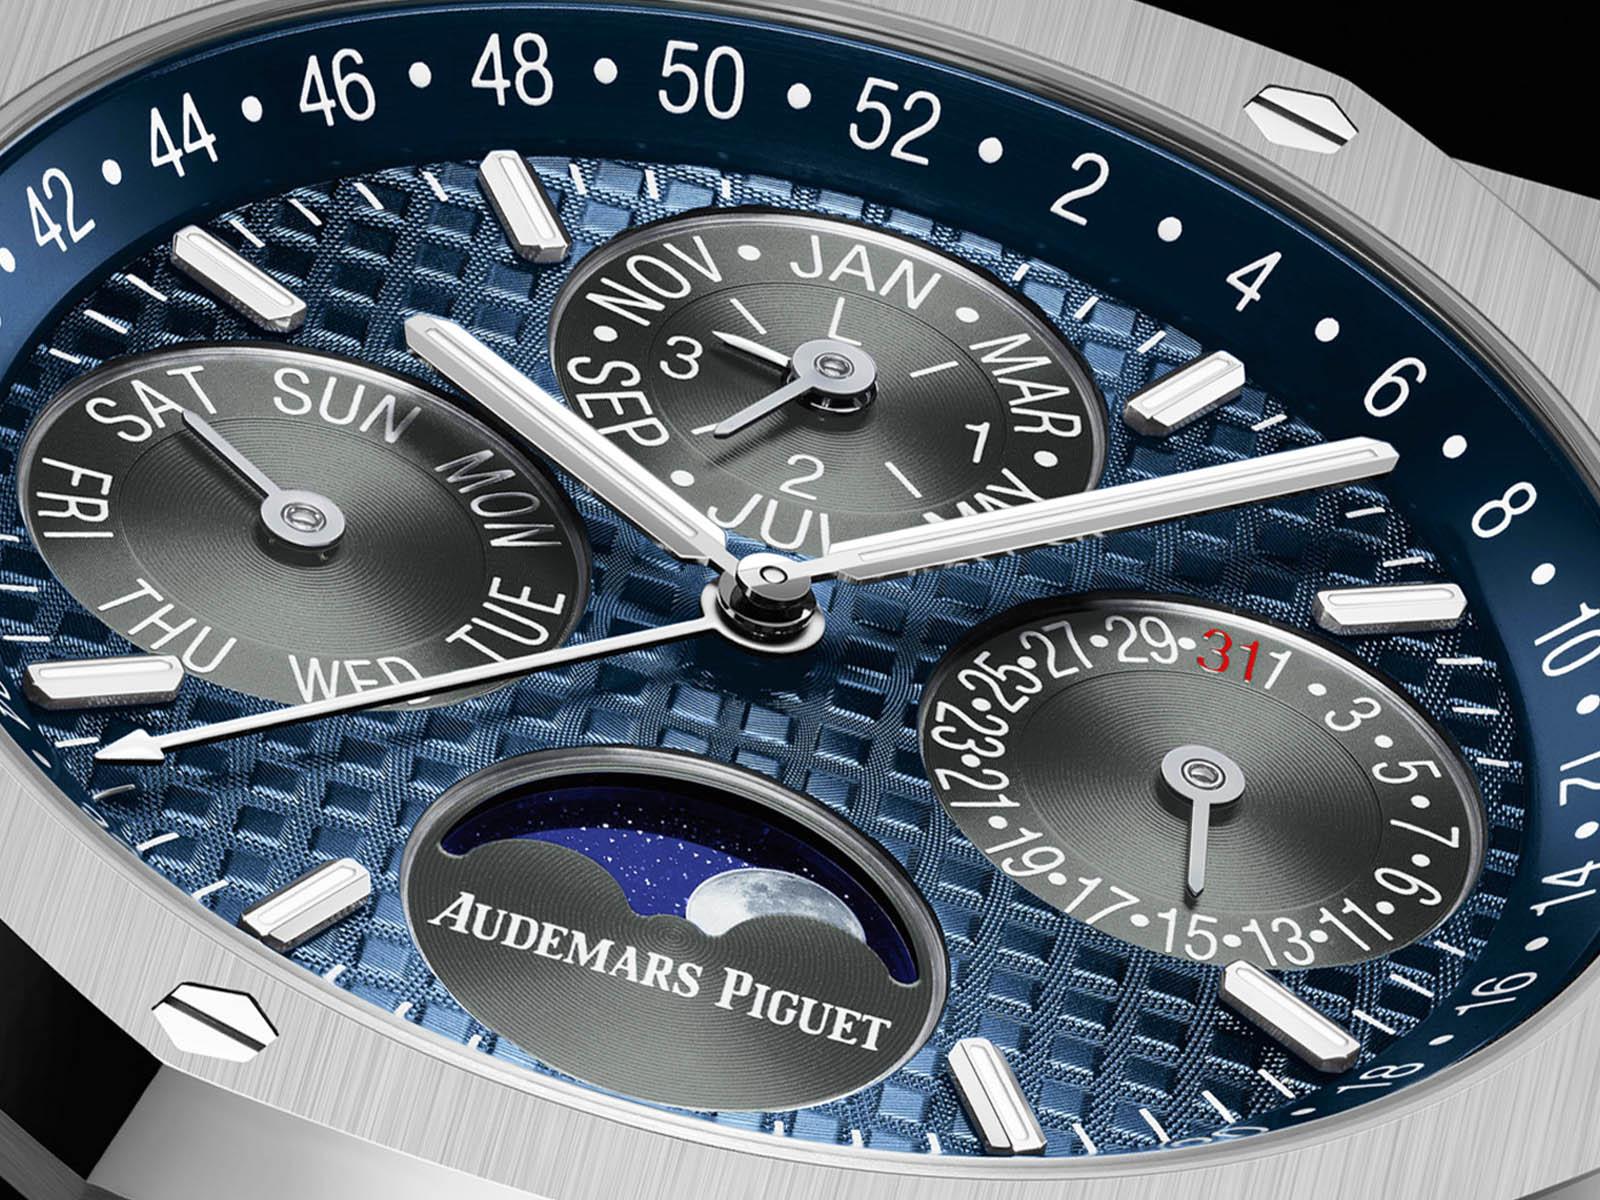 26574ti-oo-1220ti-01-audemars-piguet-royal-oak-perpetual-calendar-titanium-4.jpg